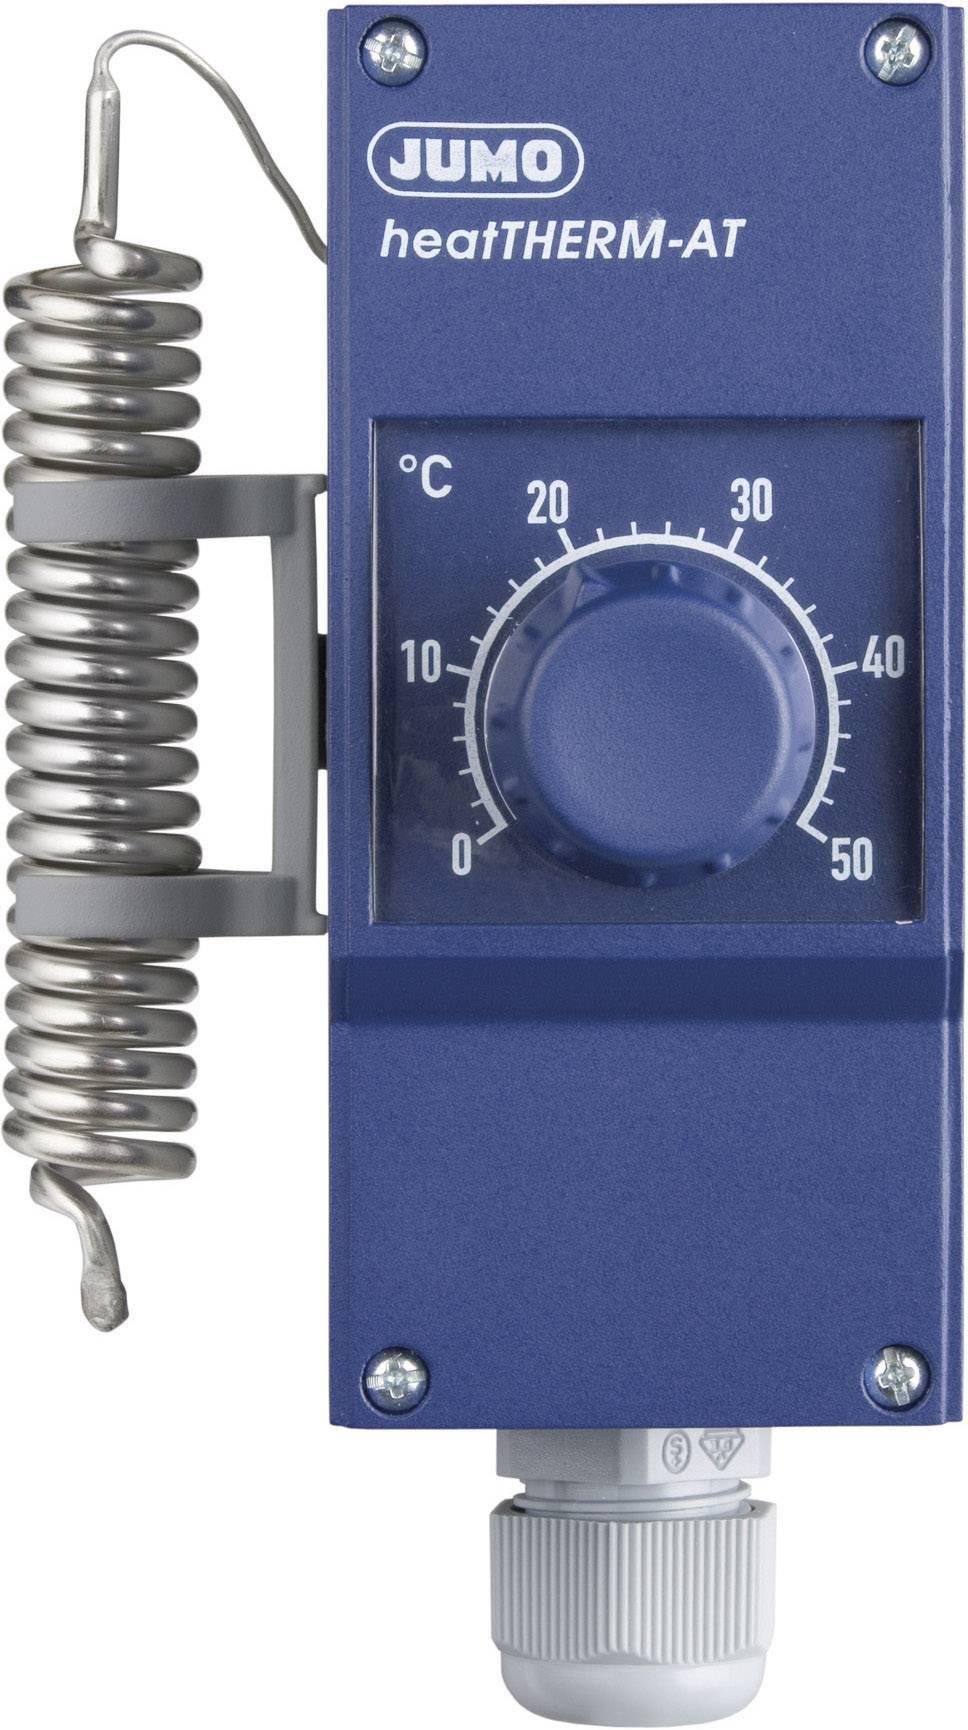 Průmyslový termostat JUMO heatTHERM TR-60/60003192, 16 A, 230 V/AC